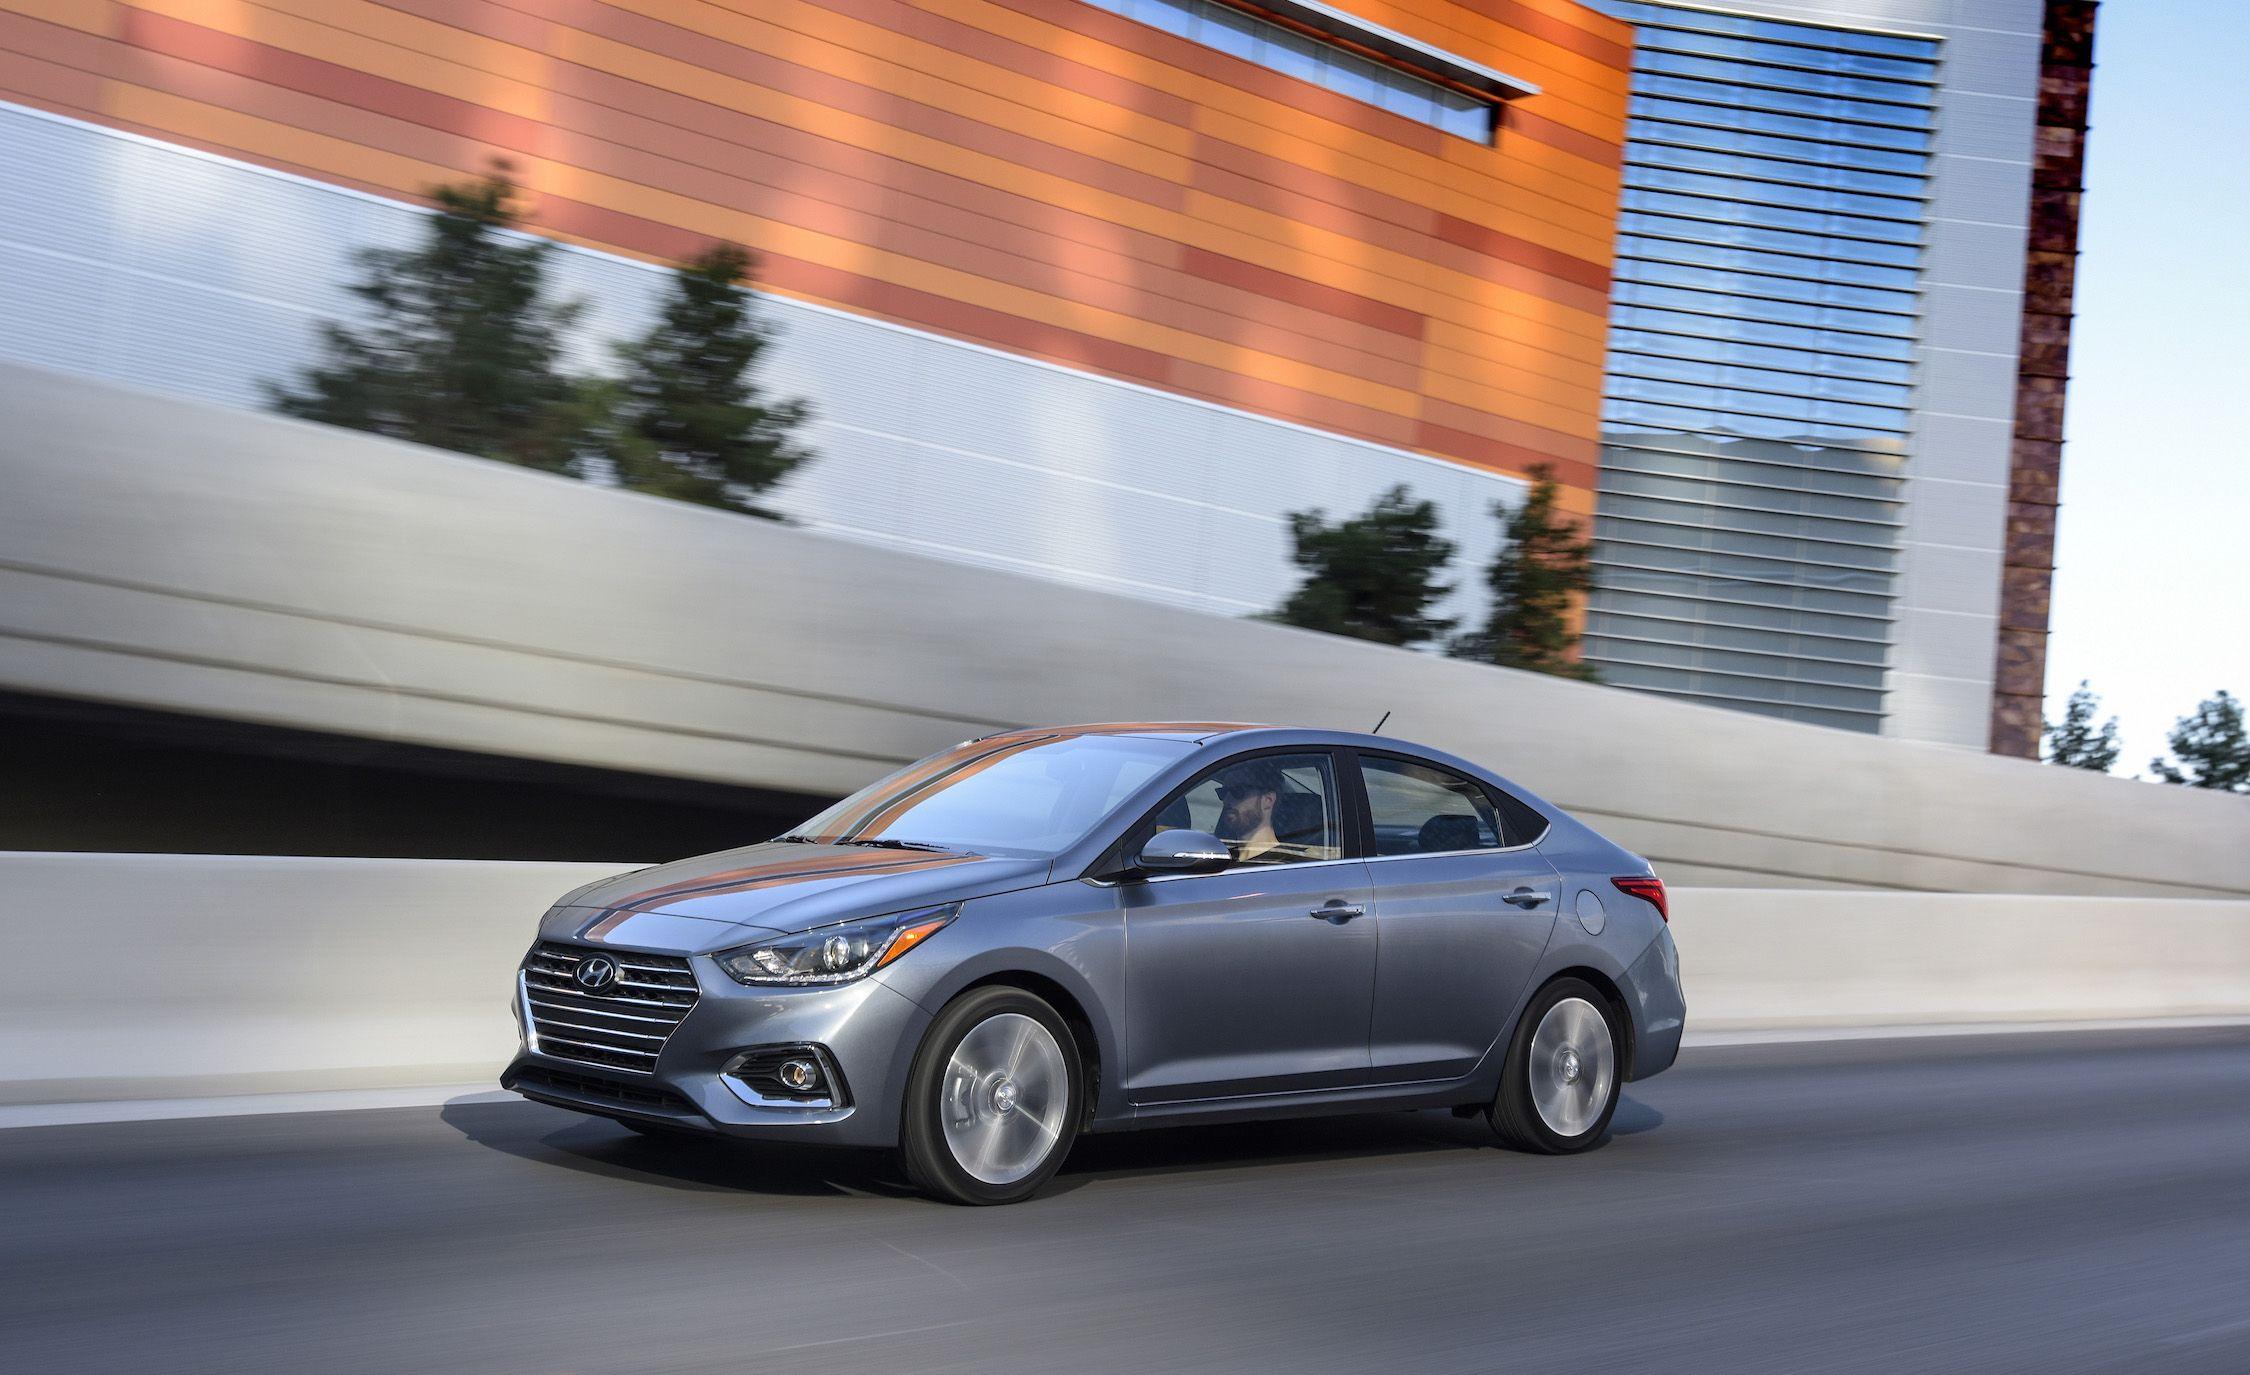 2020 Hyundai Accent Concept